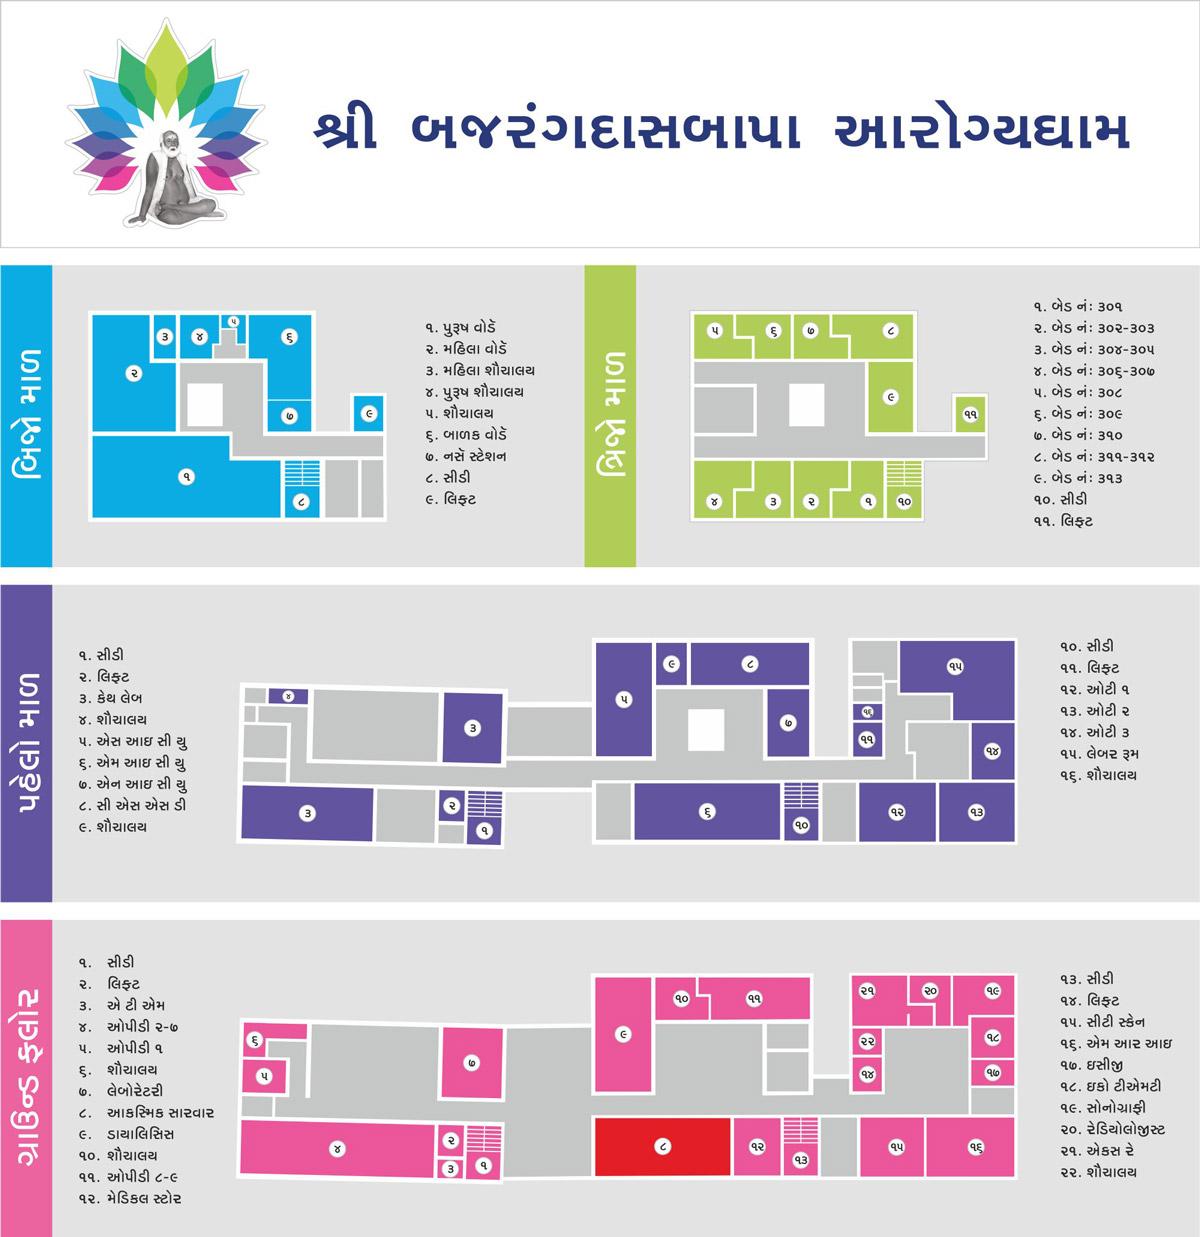 Map Signage Design for Shree Bajrangdasbapa Arogyadham